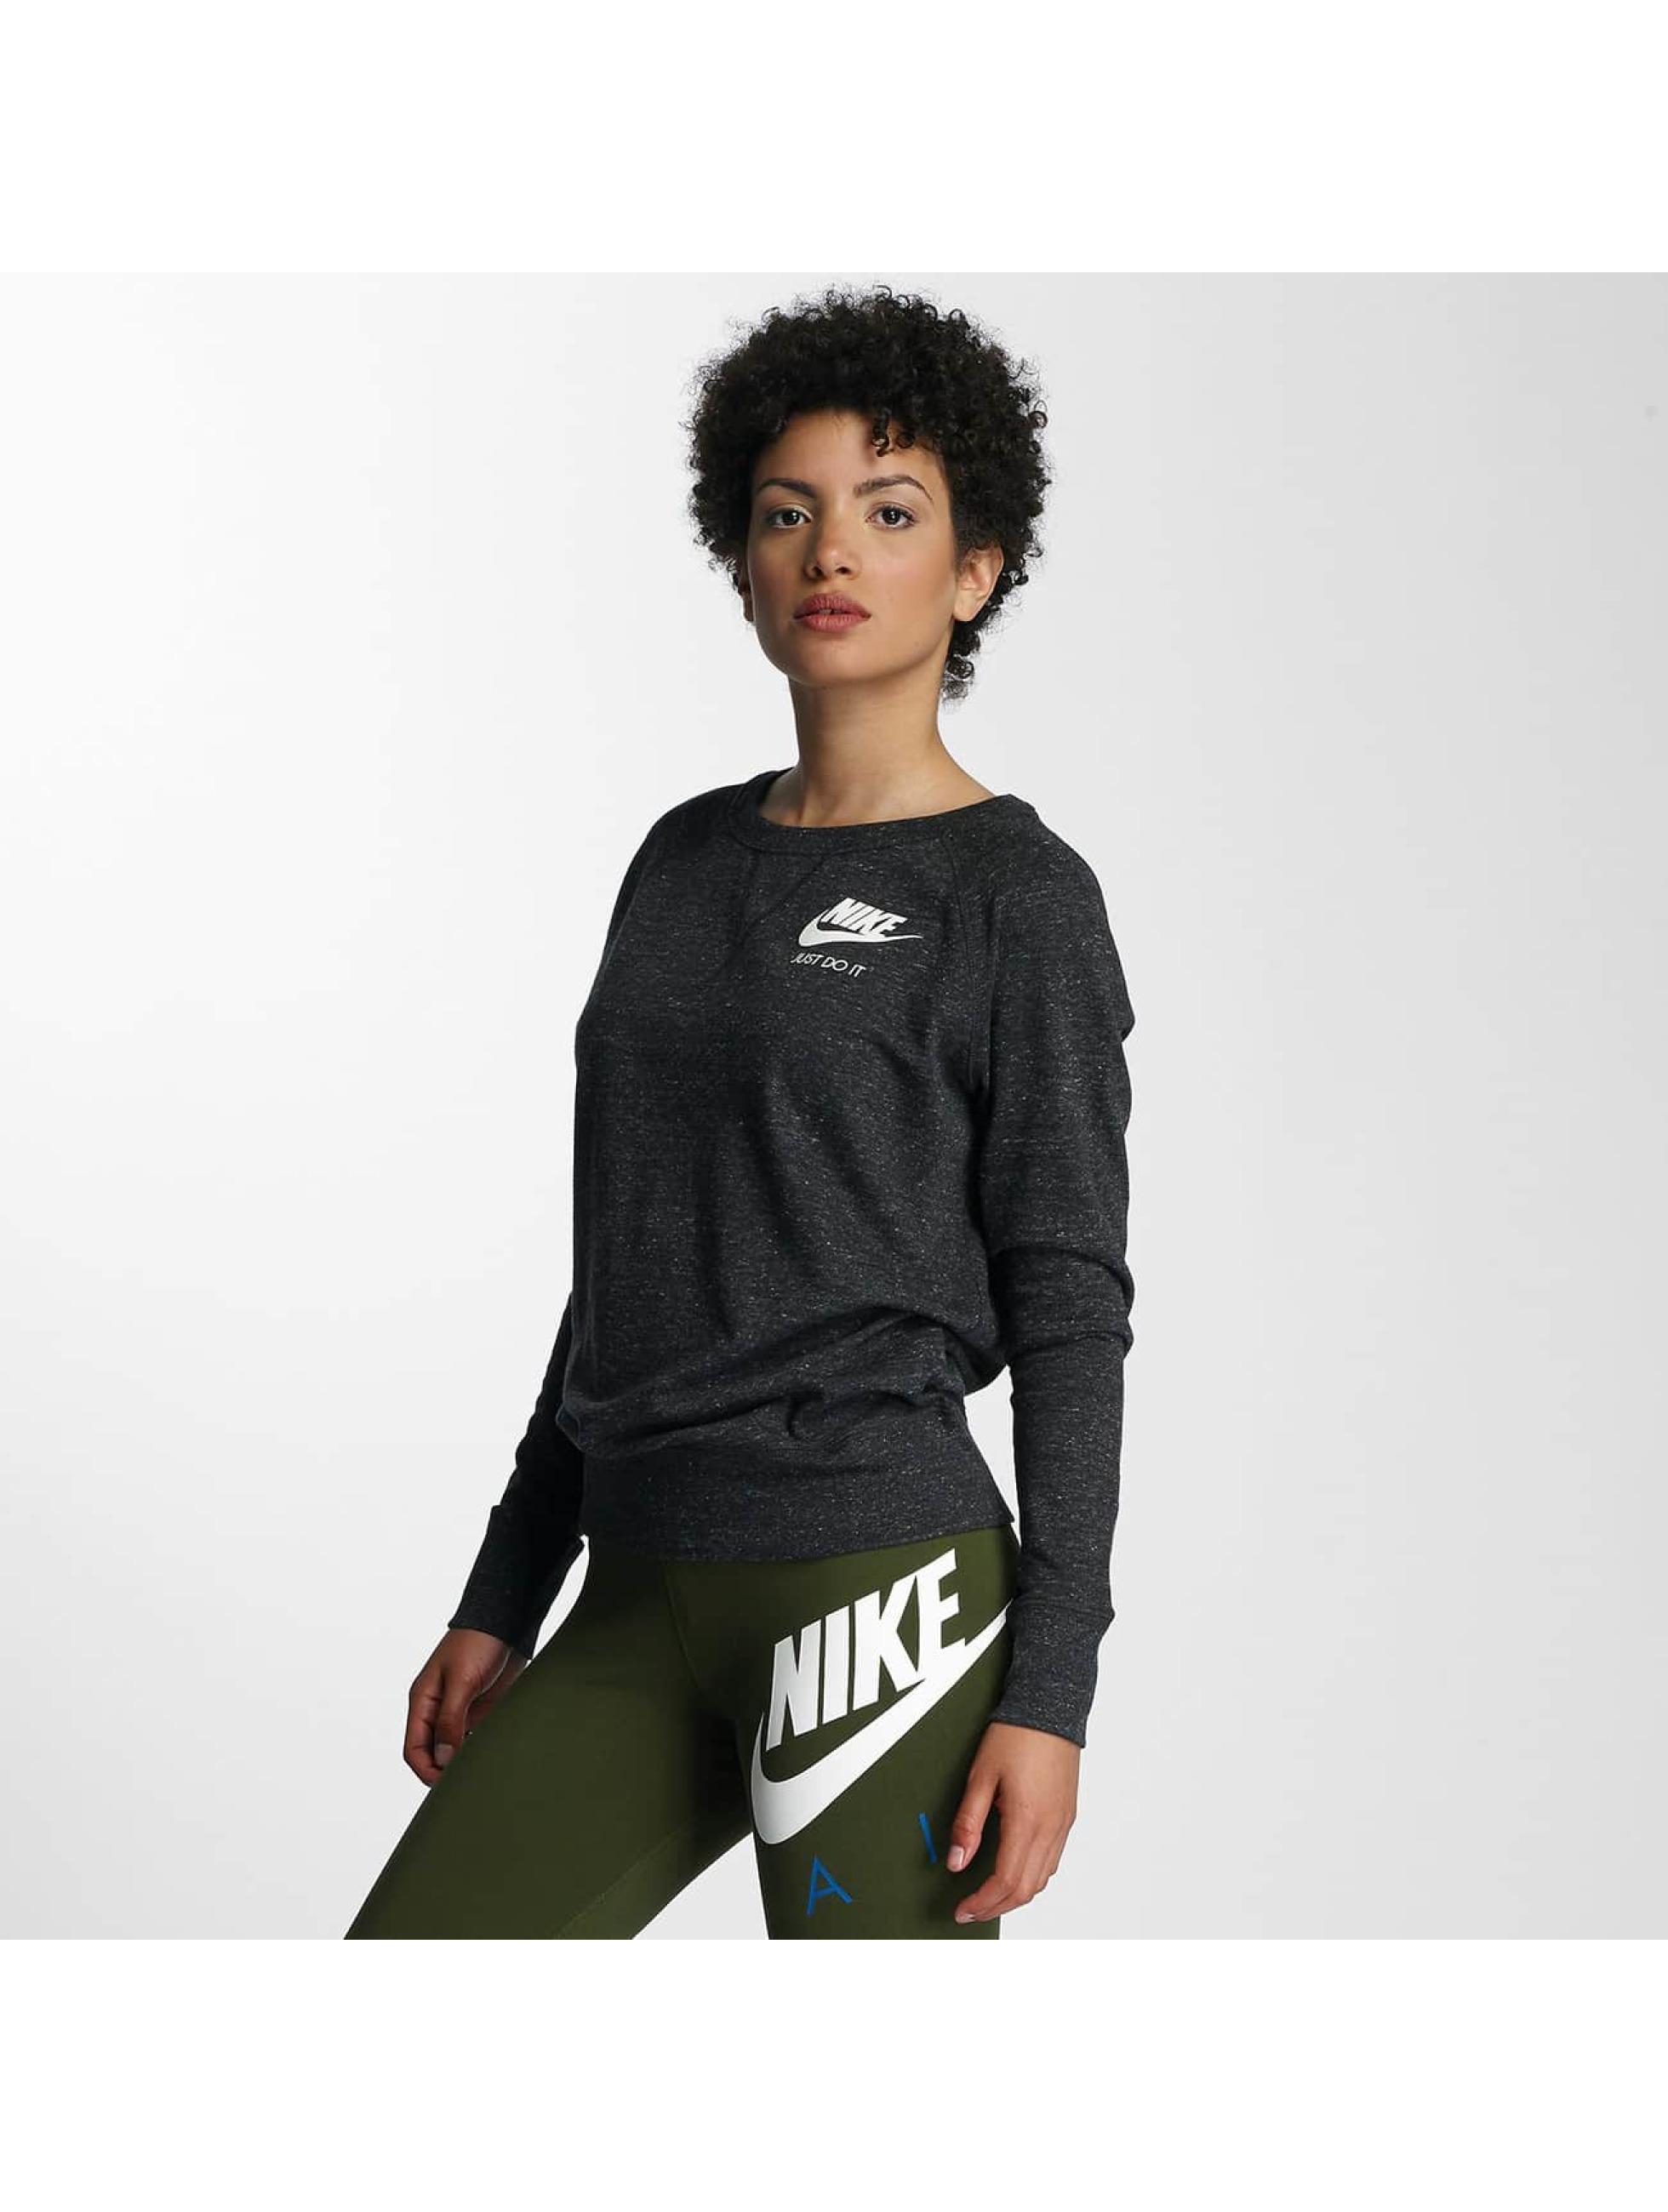 nike sportswear crew noir femme sweat pull nike acheter pas cher haut 309549. Black Bedroom Furniture Sets. Home Design Ideas